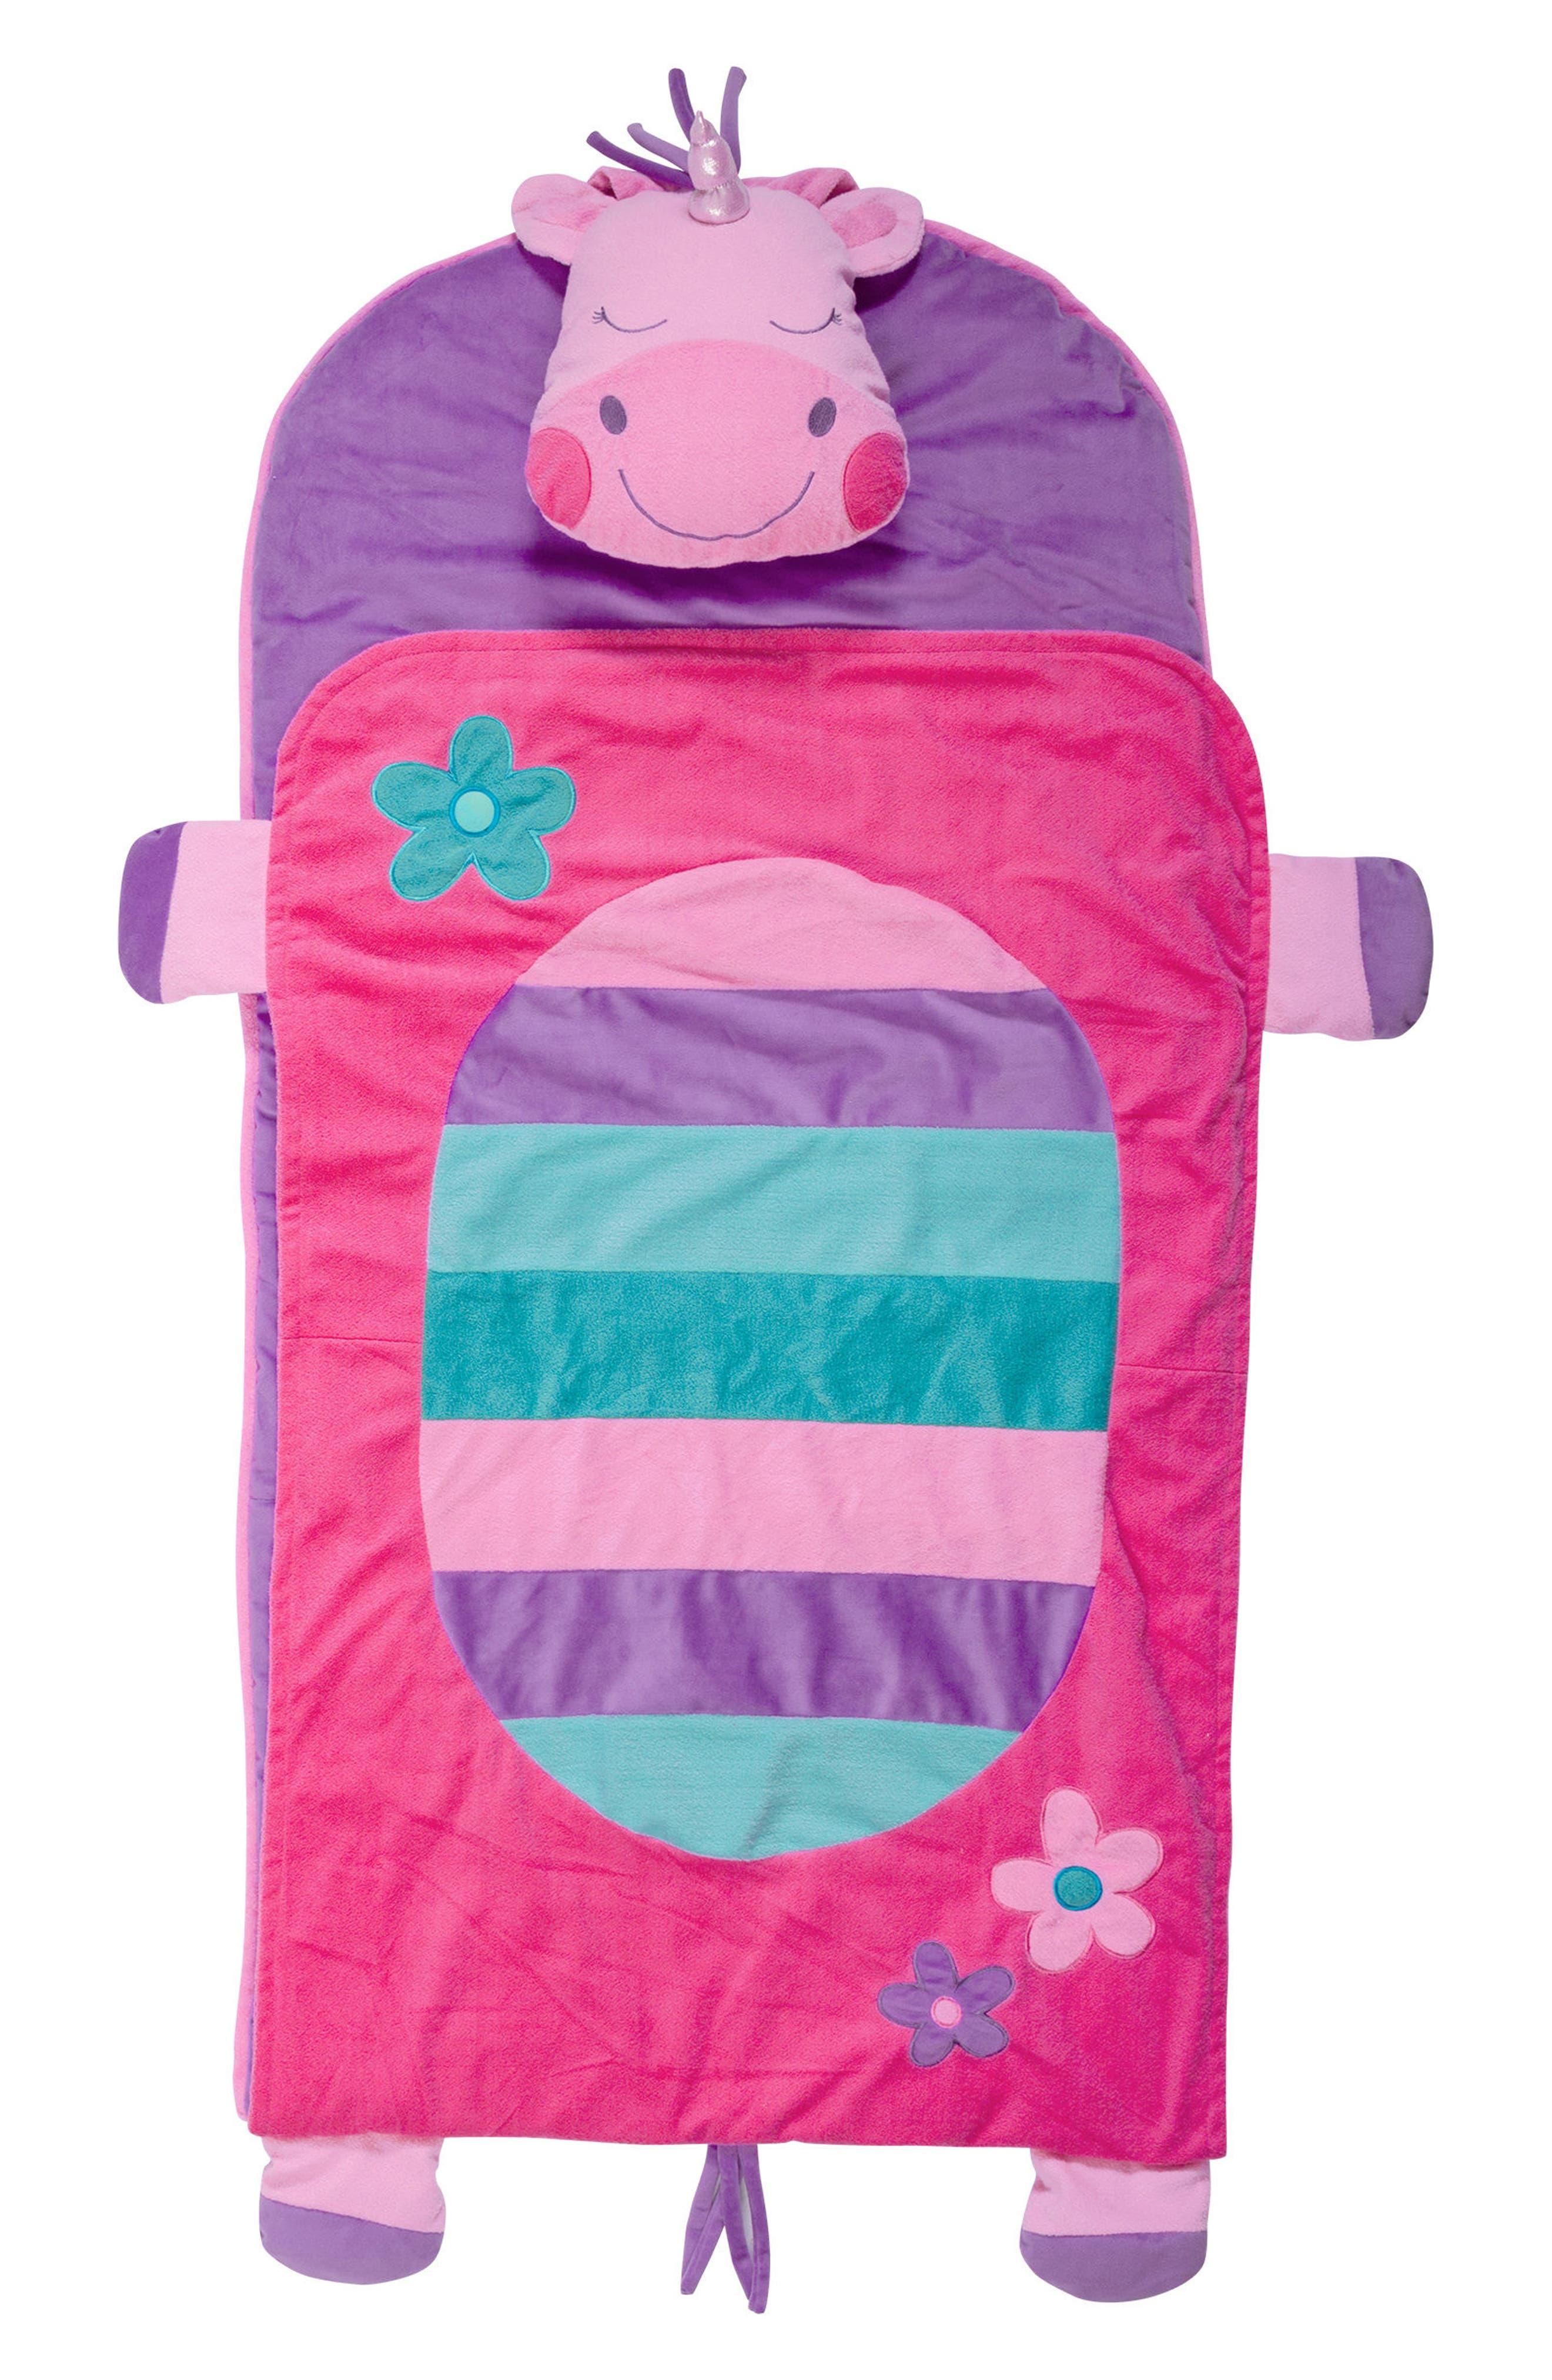 Portable Nap Mat, Pillow & Blanket,                         Main,                         color, Unicorn